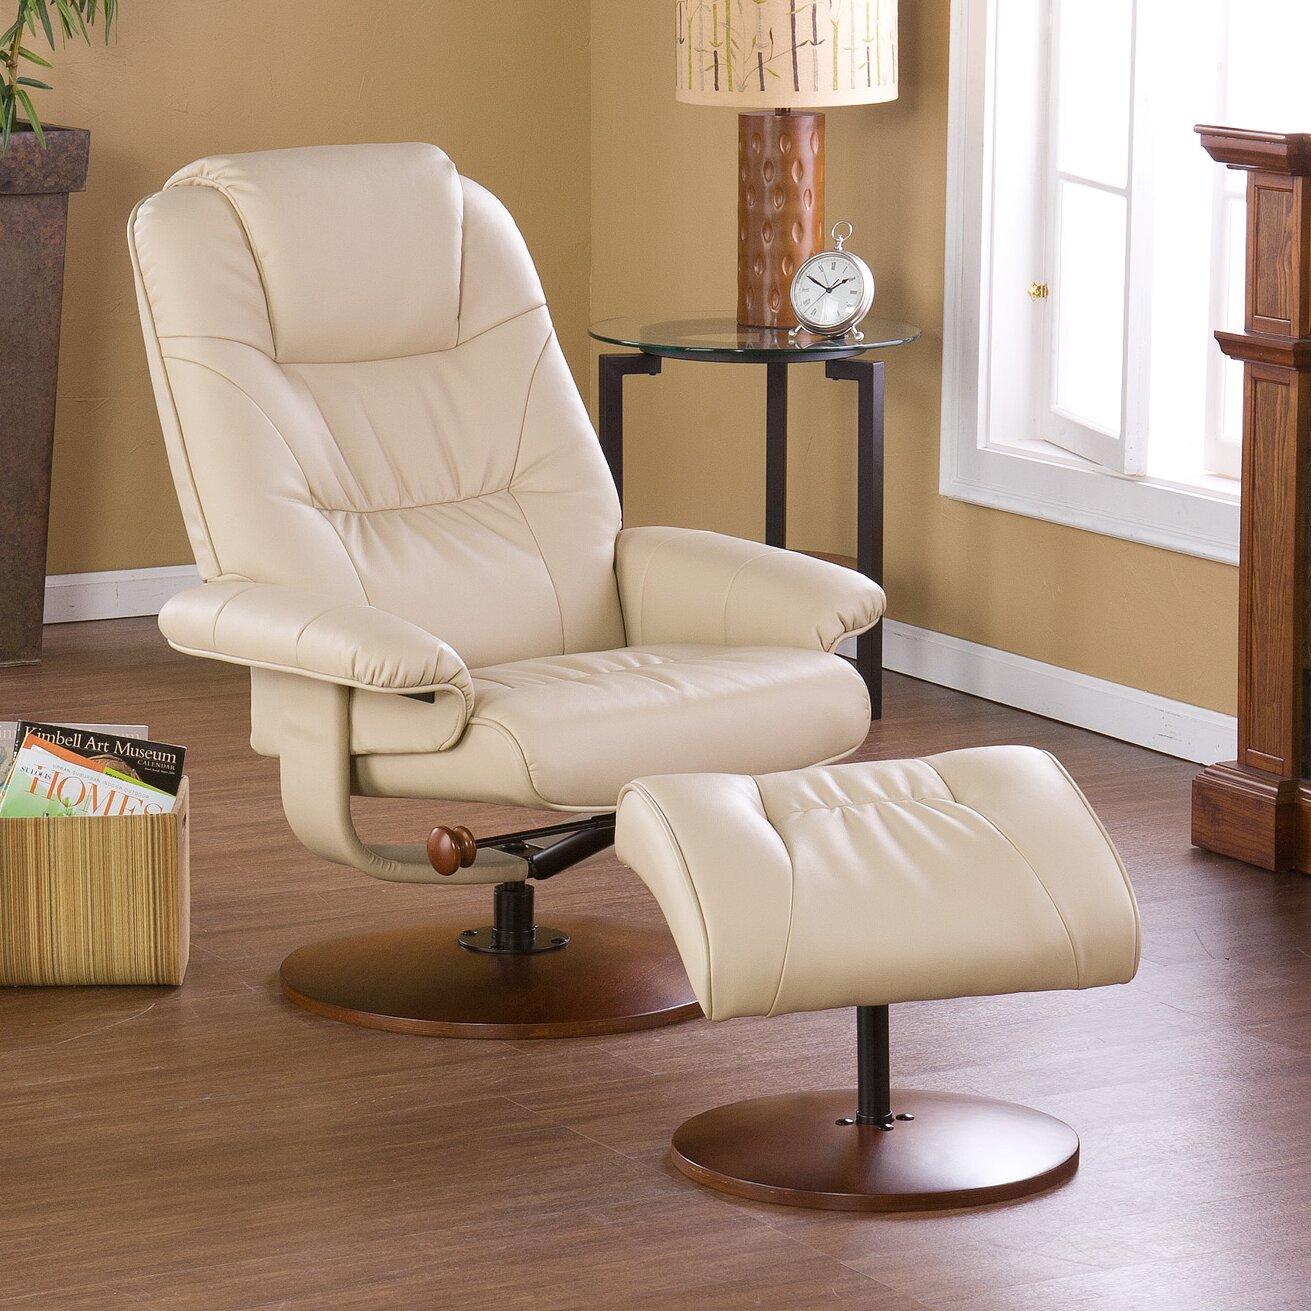 Stunning Ergonomic Living Room Furniture Images Home Design Ideas